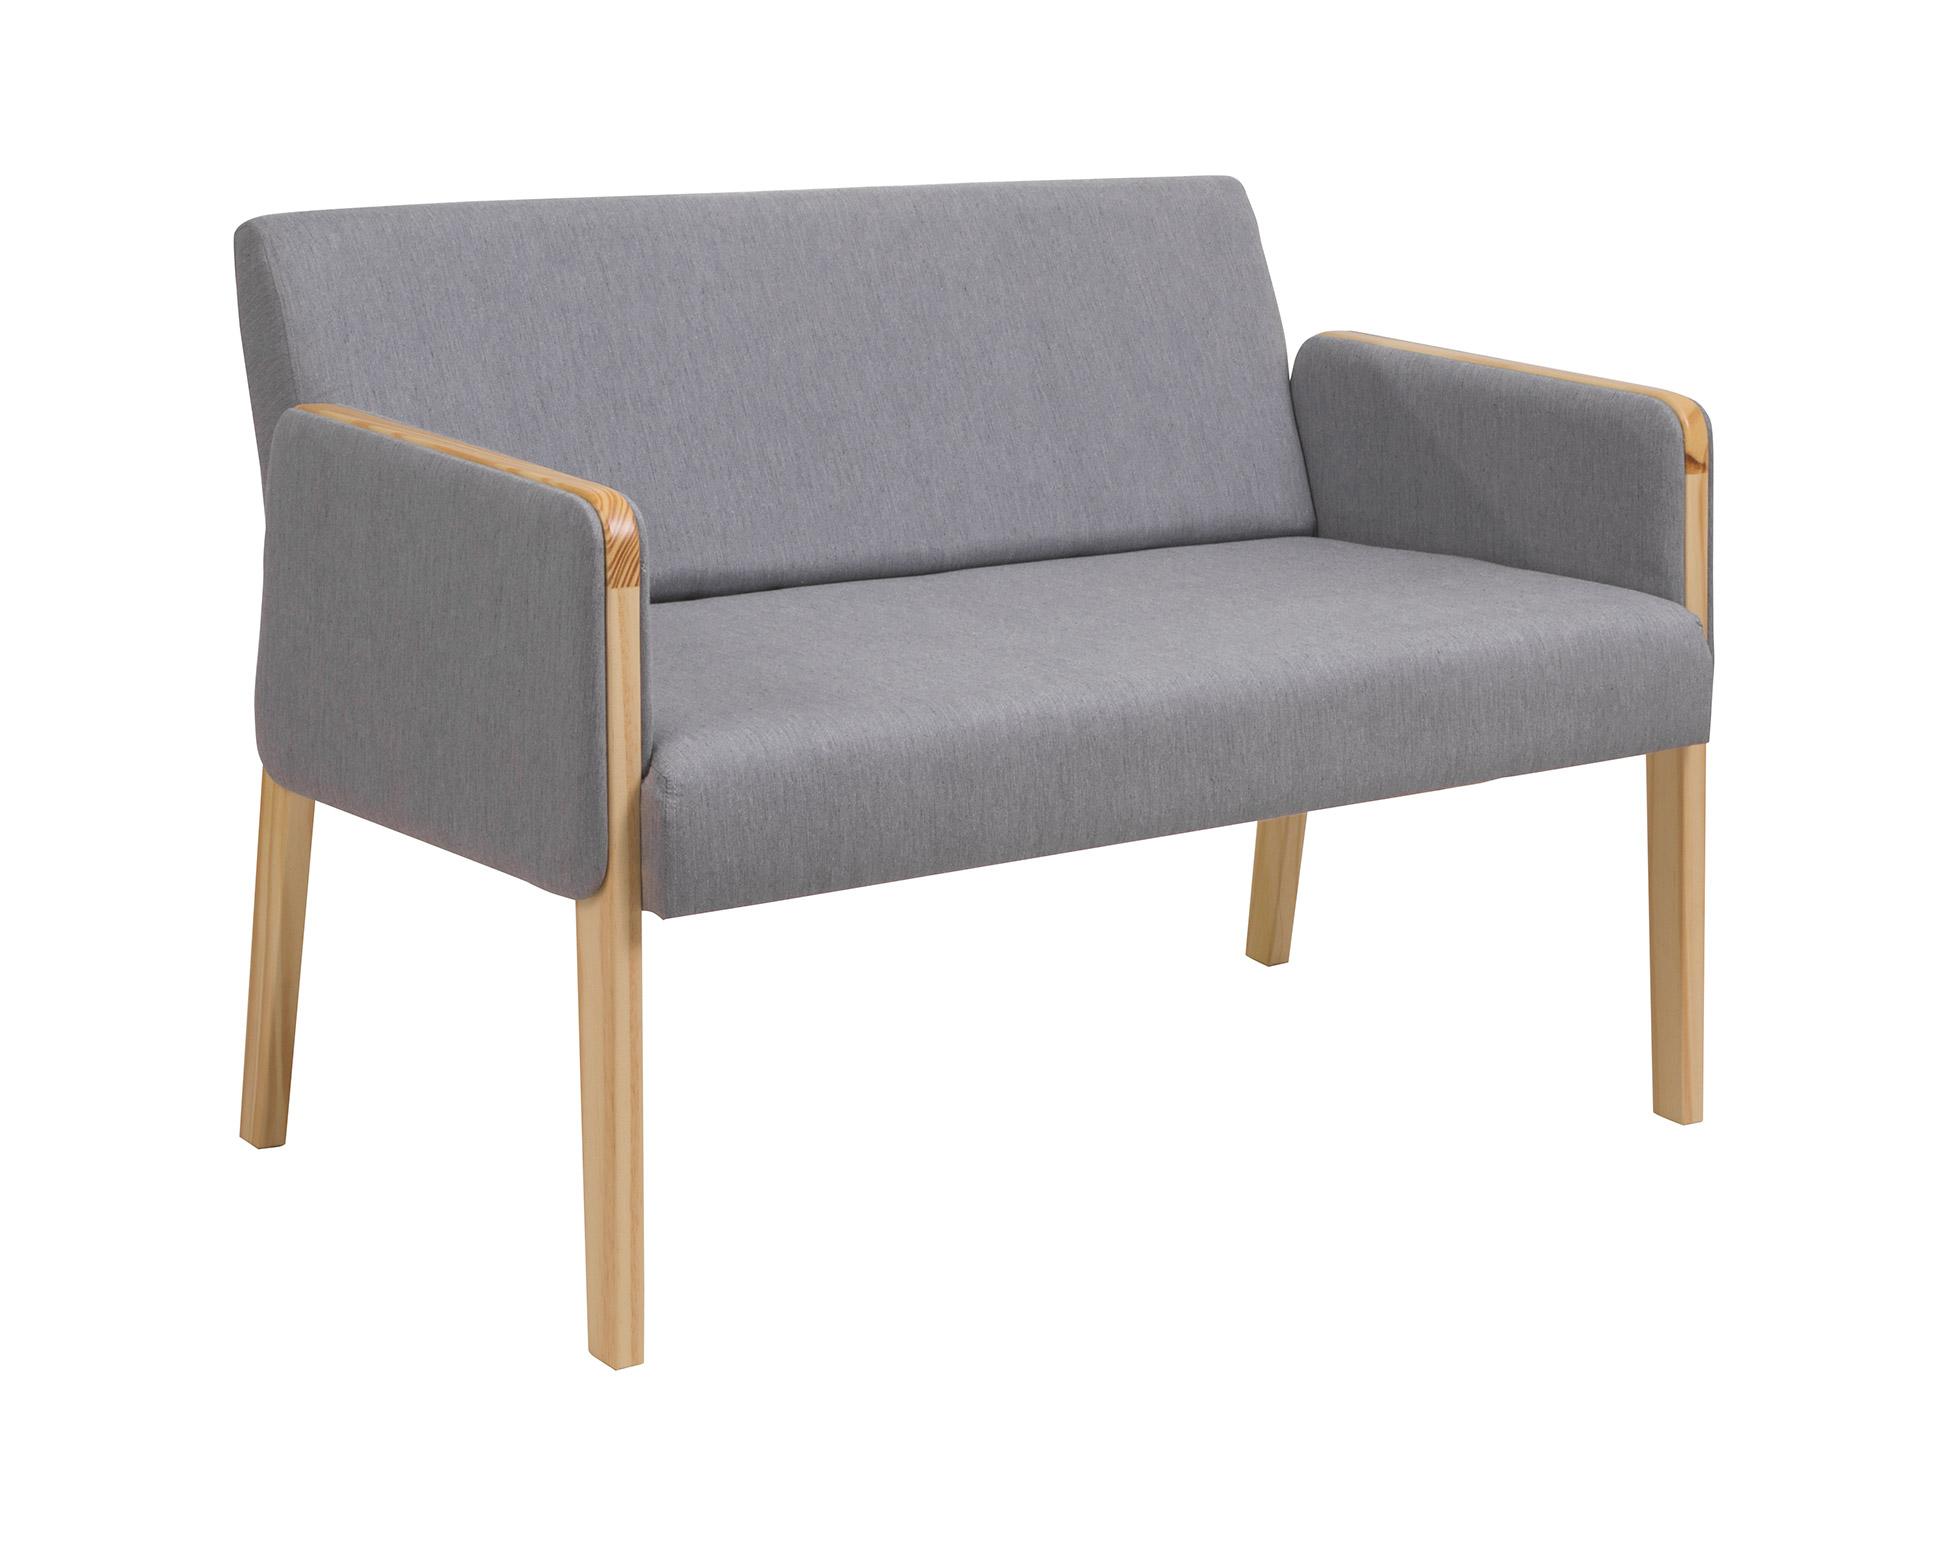 cadeira-rosini-base-trigo-e-tecido-cinza